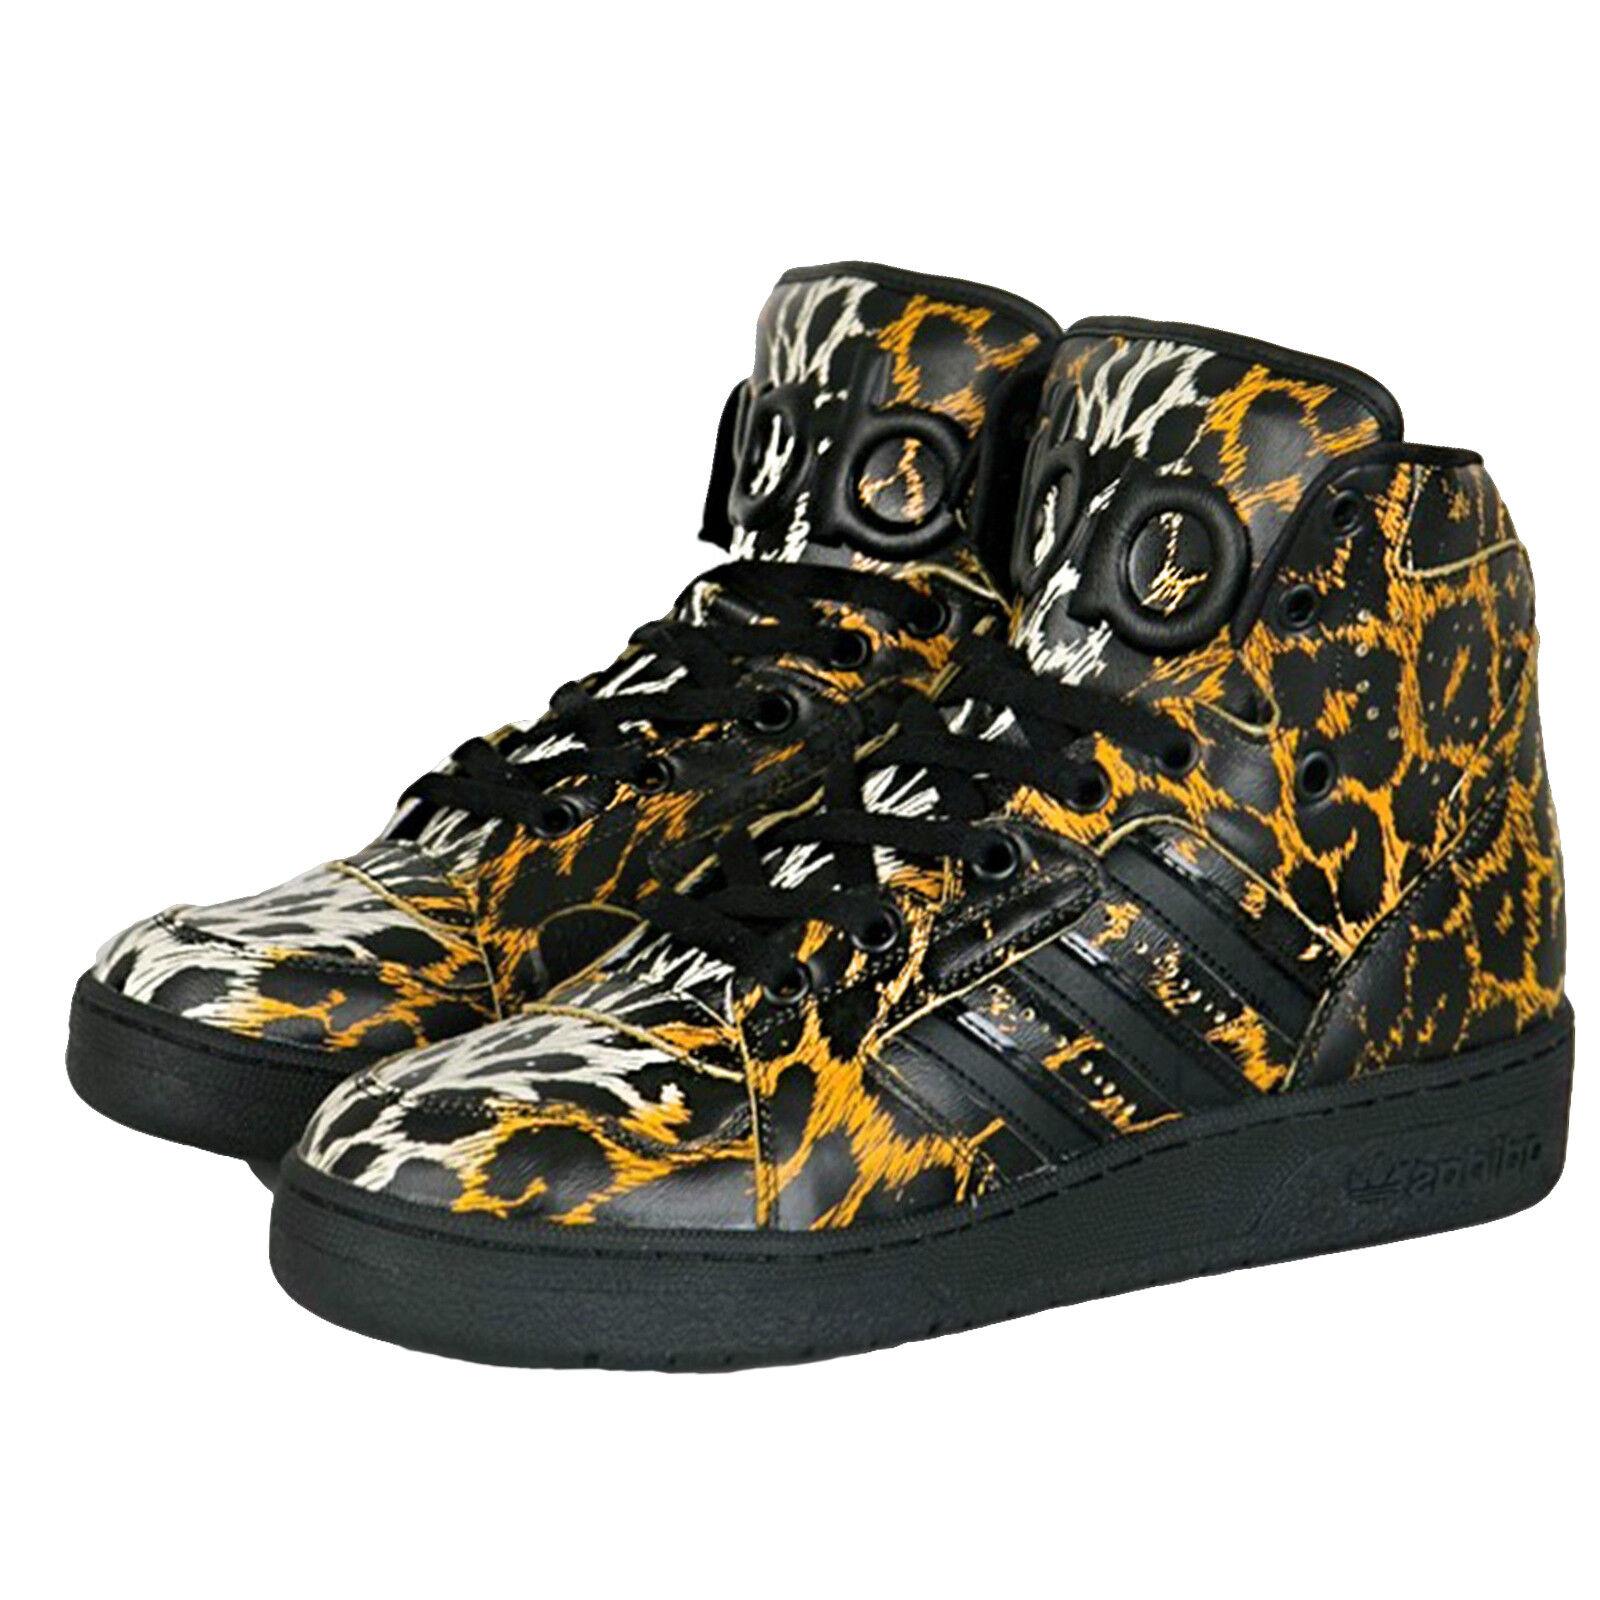 ADIDAS Scarpe Uomo Jeremy Scott 37 38 39 40 41 42 d659 4,5 6,5 8,5 8 9,5 shoes   Beni diversi    Maschio/Ragazze Scarpa